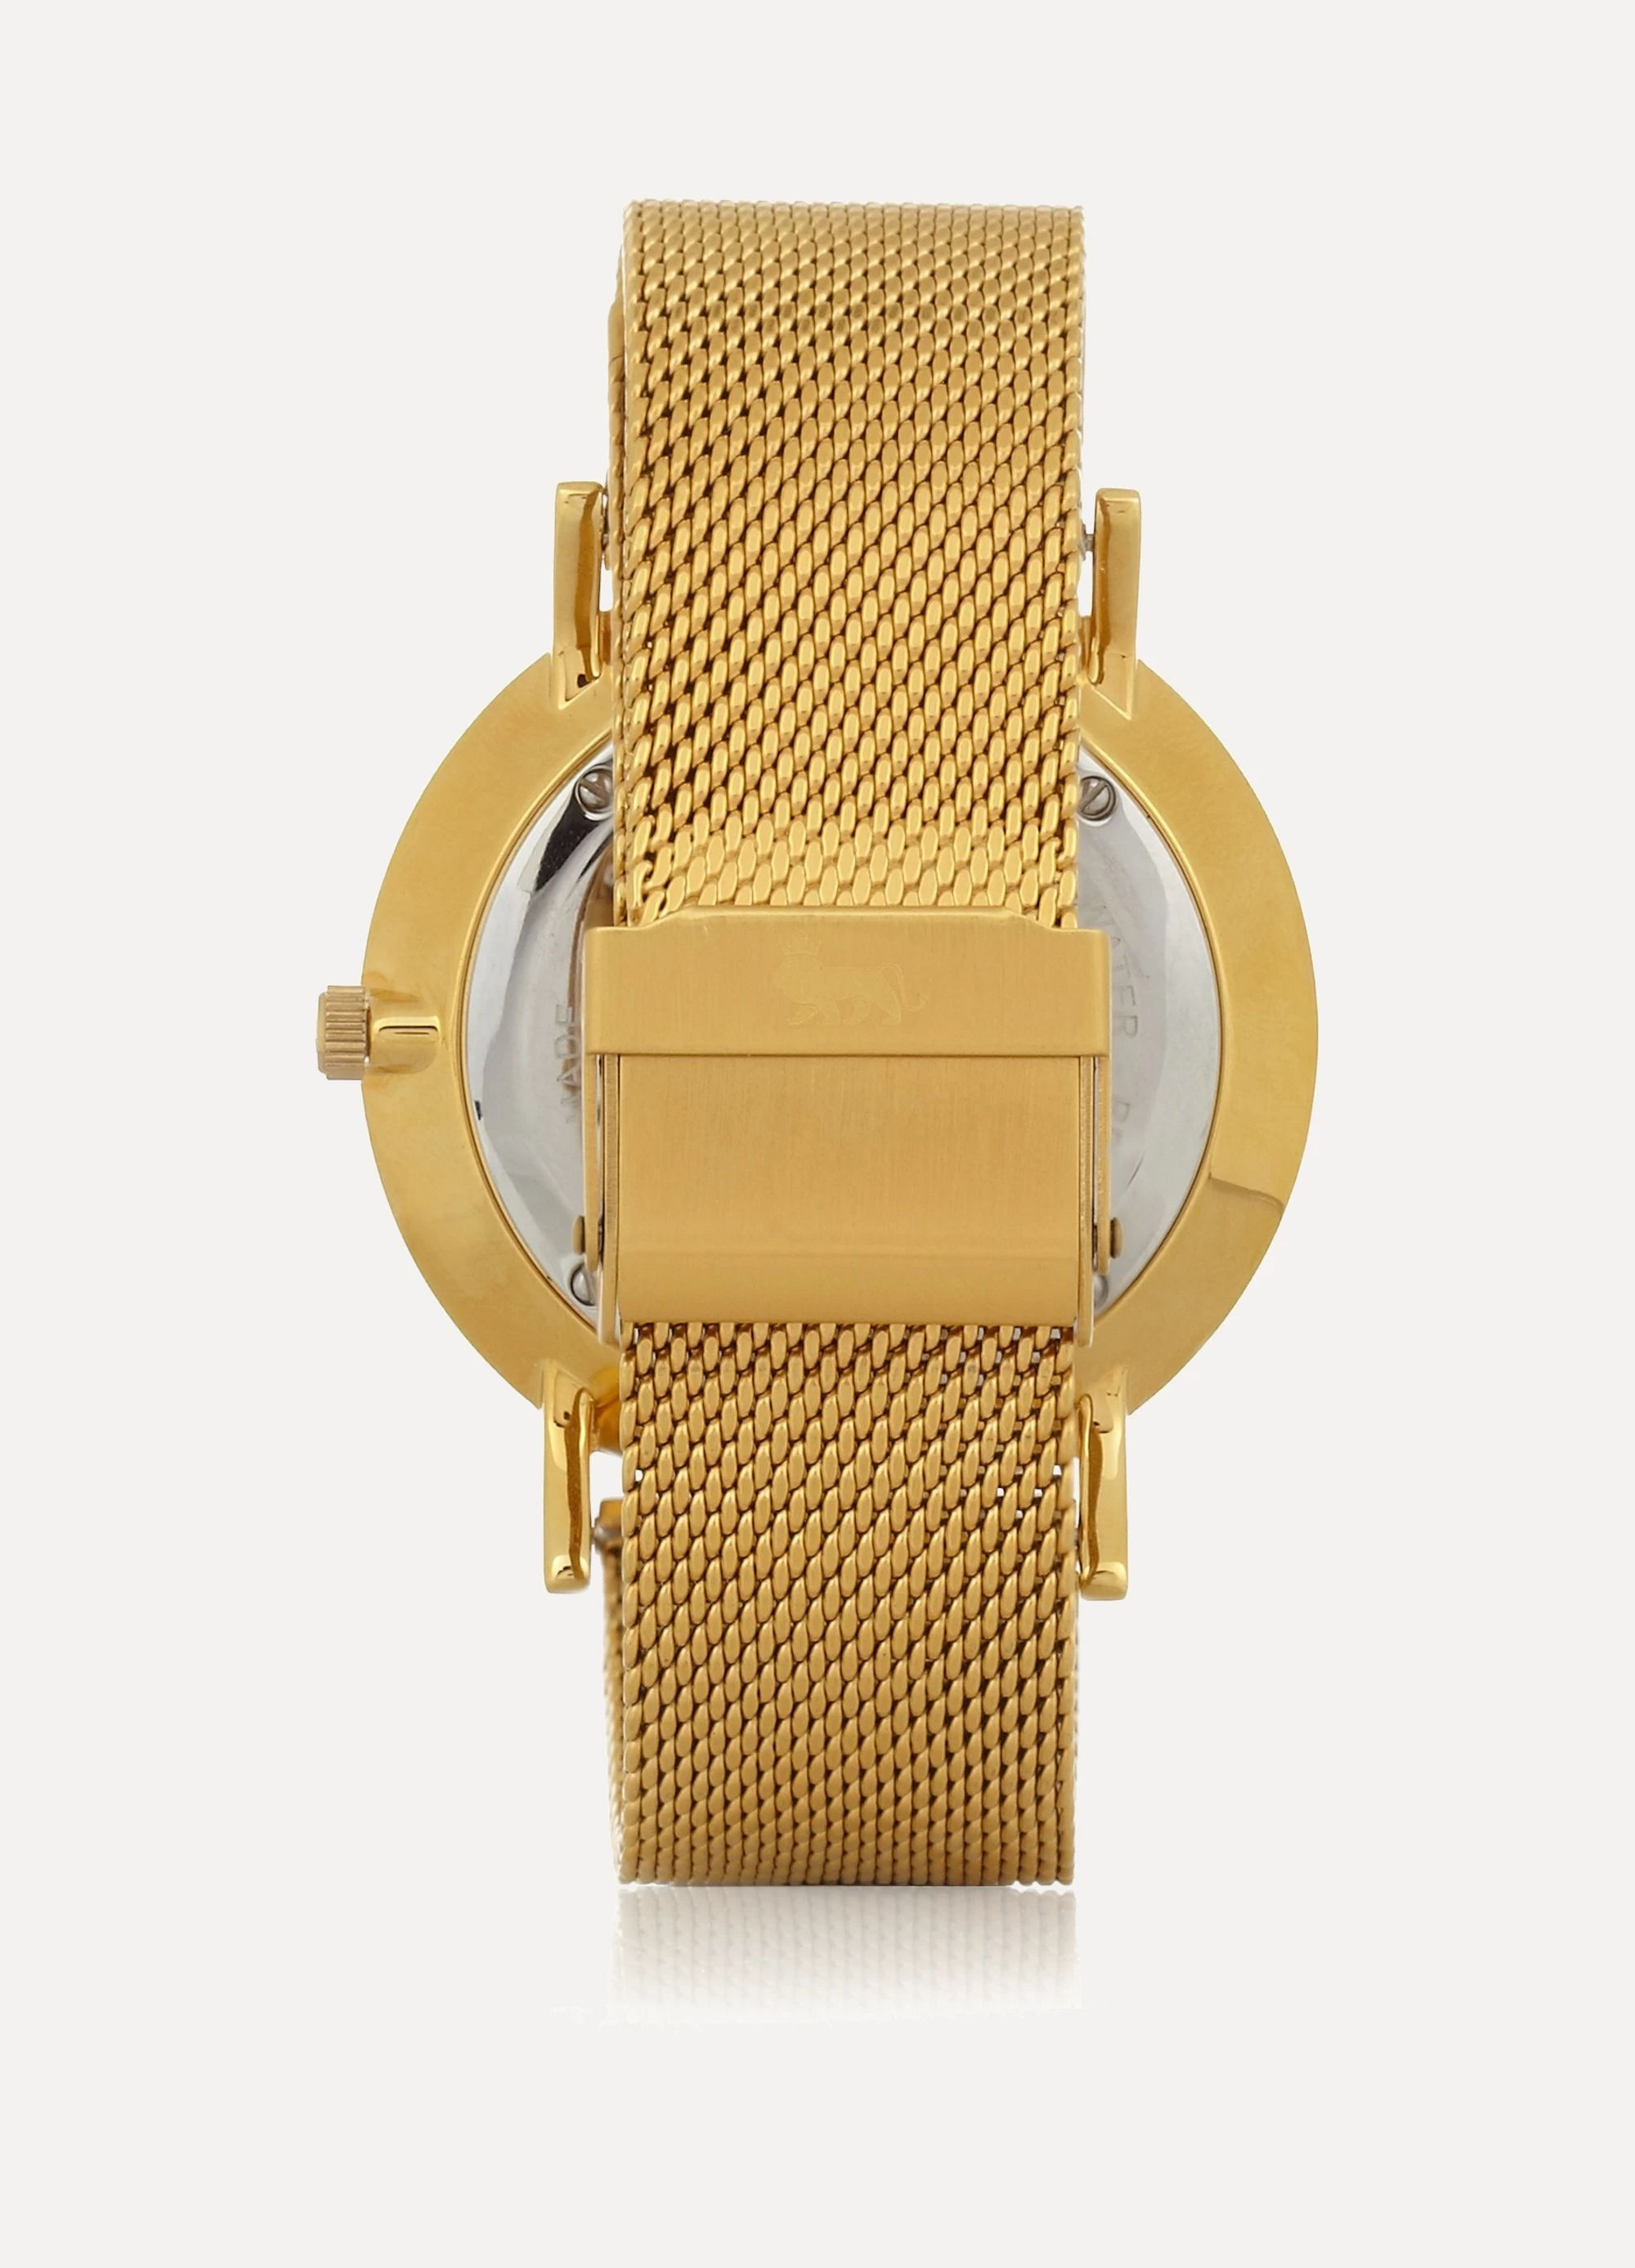 Larsson & Jennings CM gold-plated watch